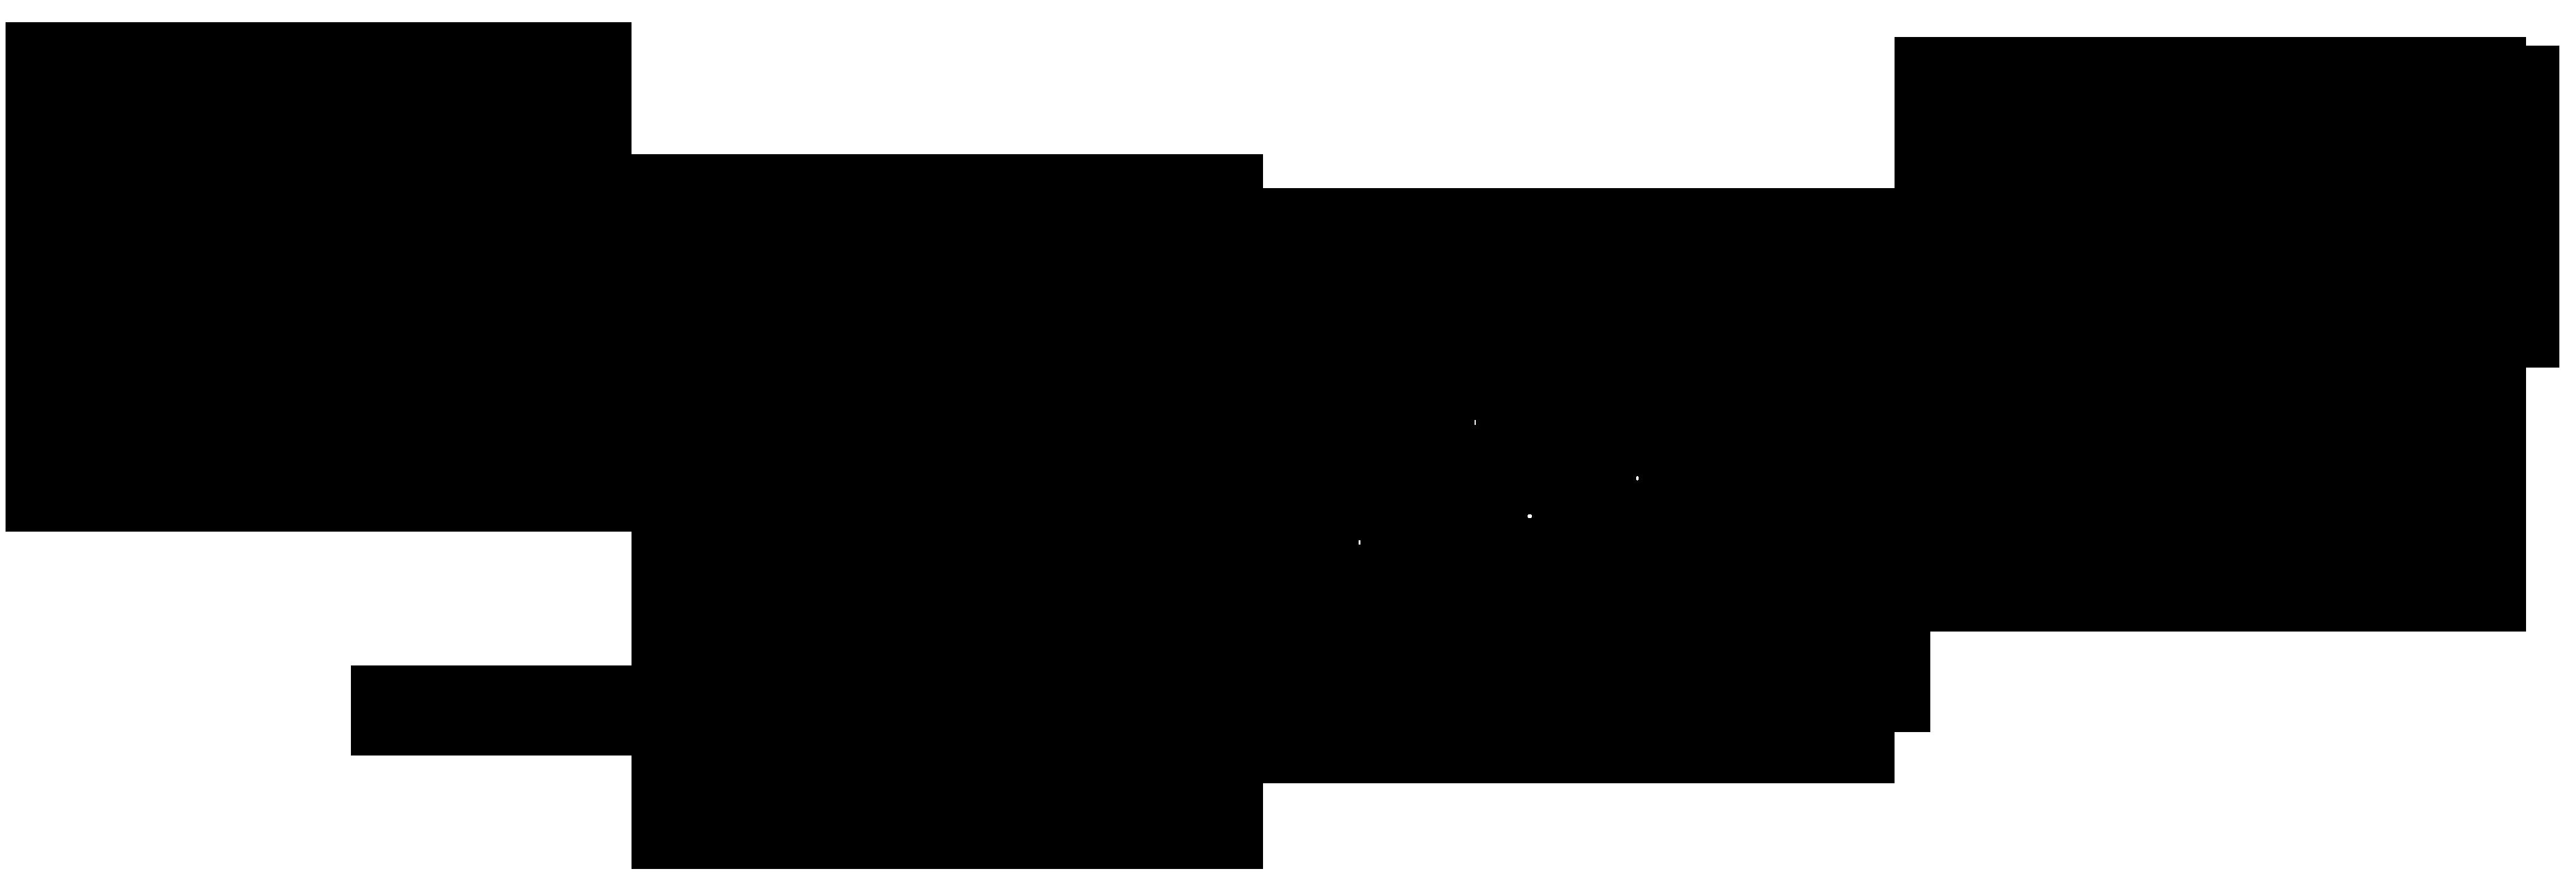 doctor signature font generator thepixinfo